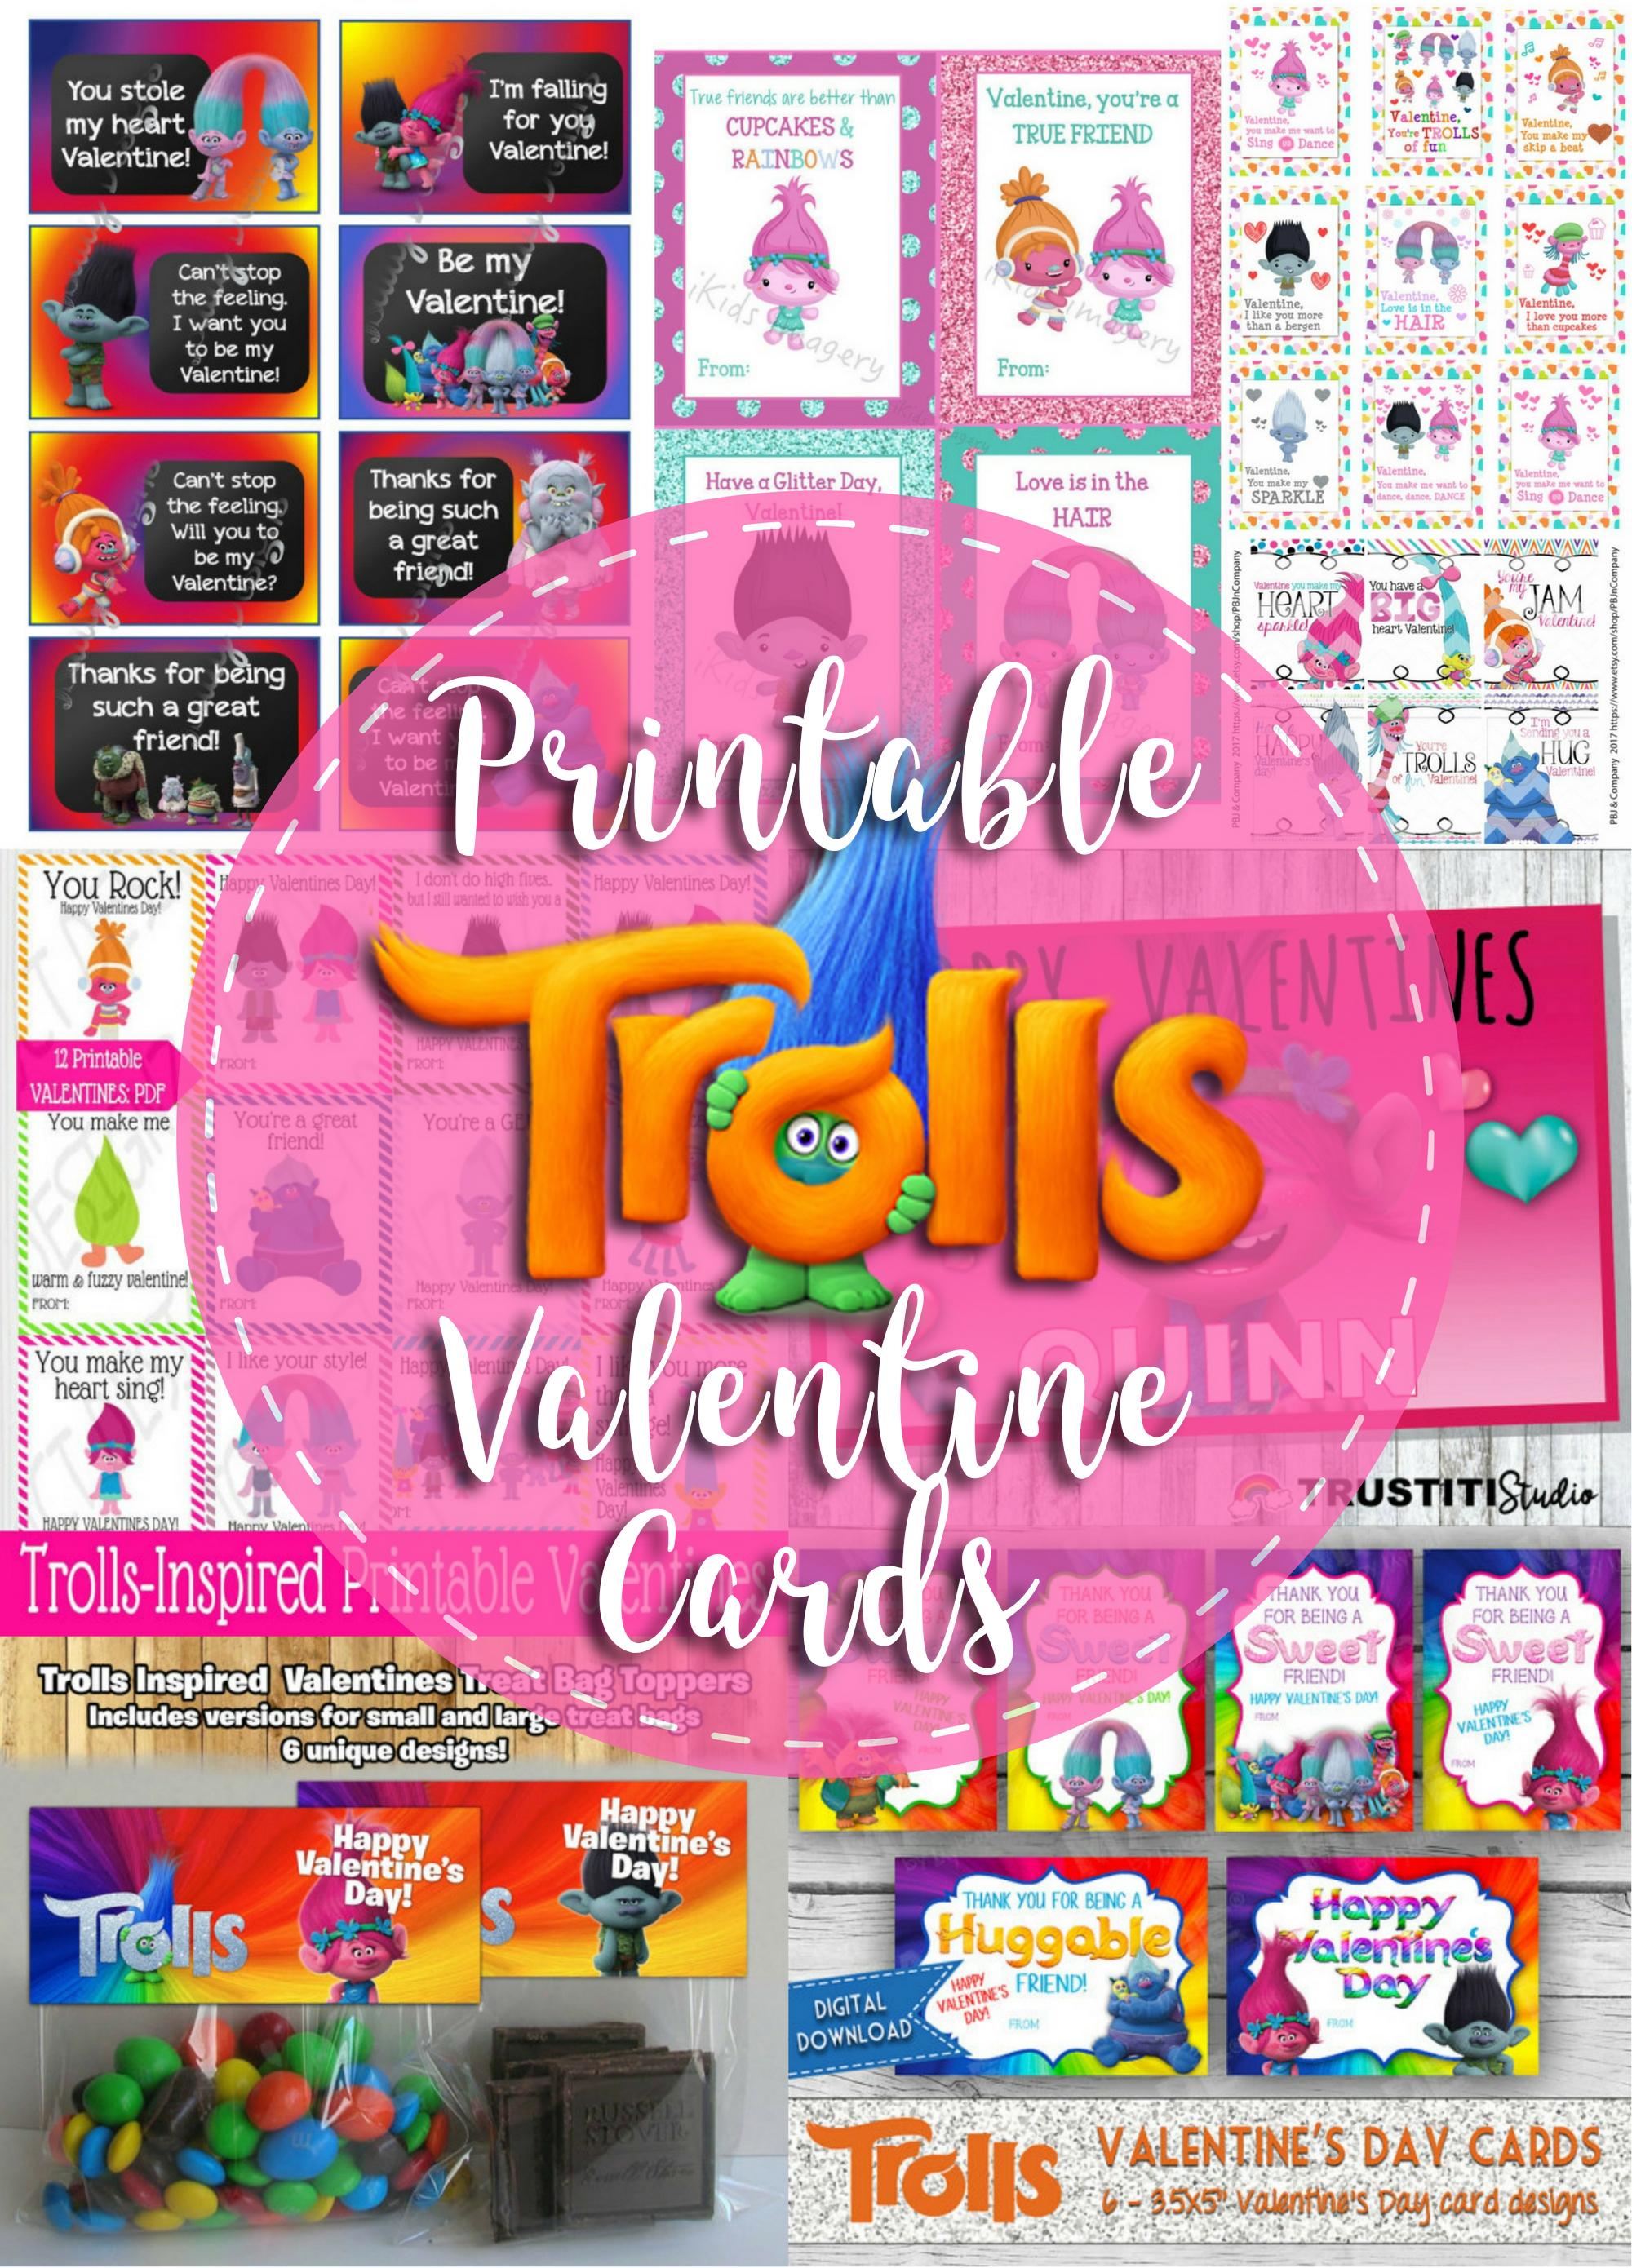 Printable Trolls Valentine's Cards For Kids